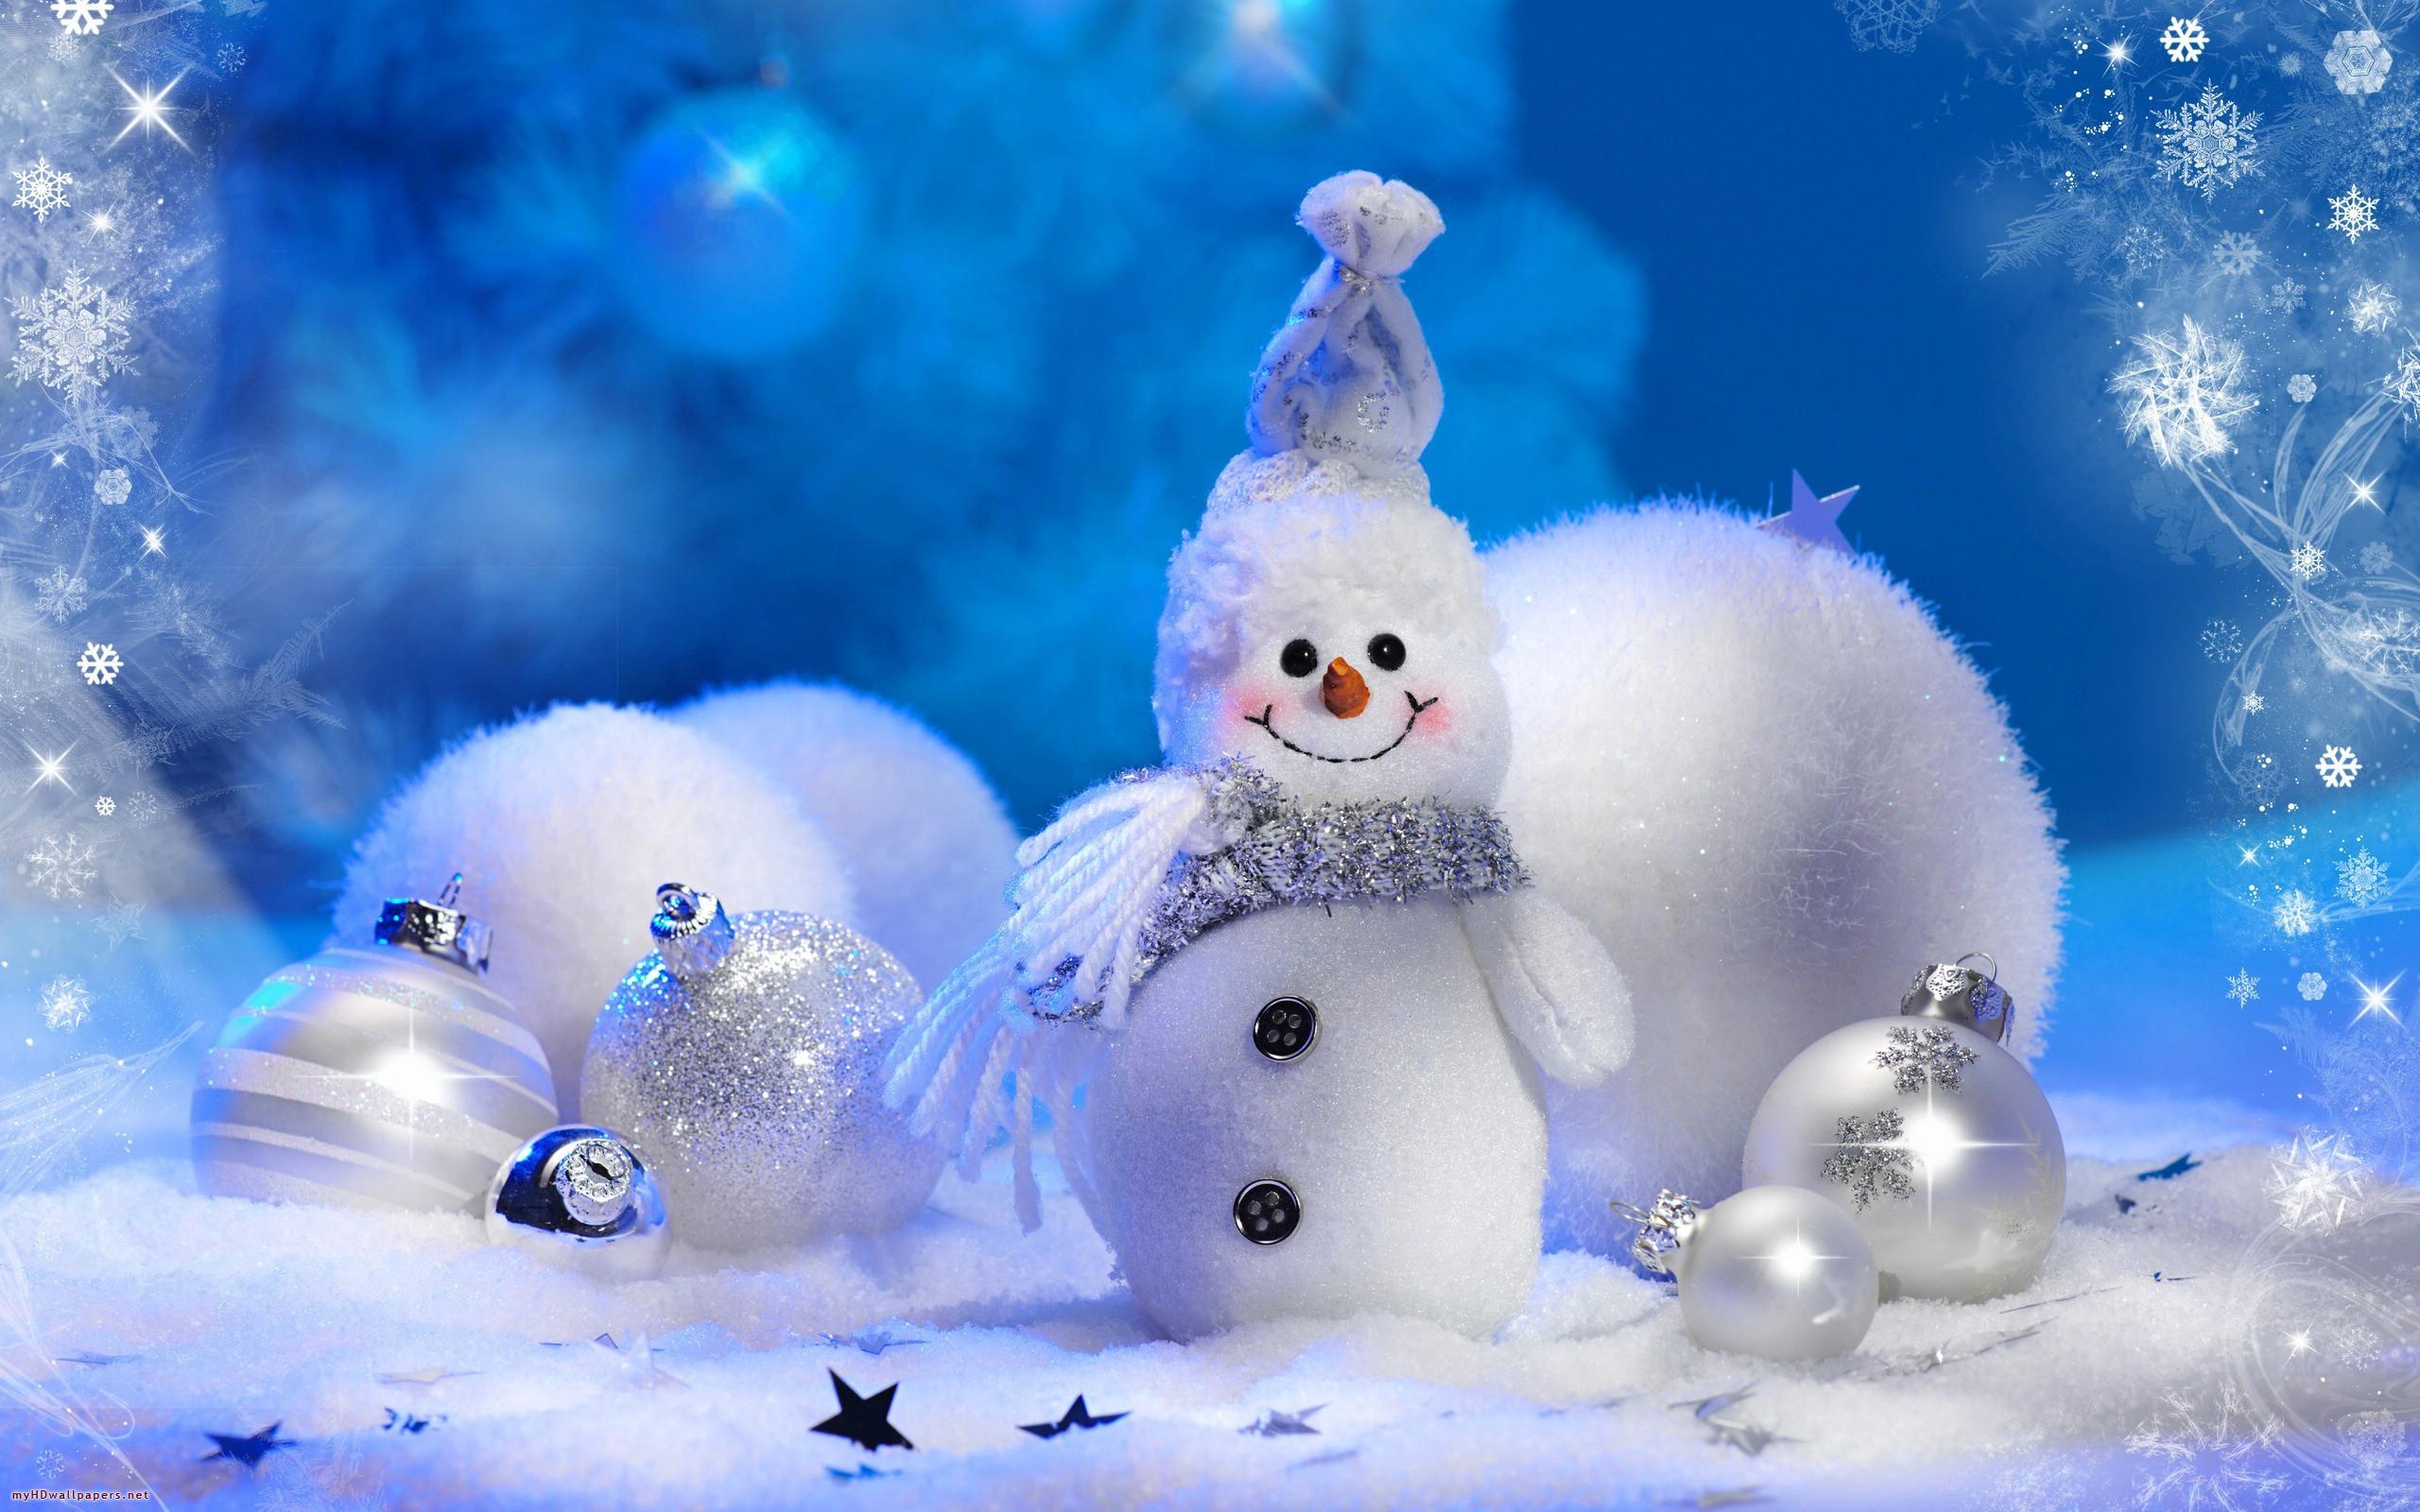 Christmas Hd Wallpaper Background Image 2560x1600 Id 117876